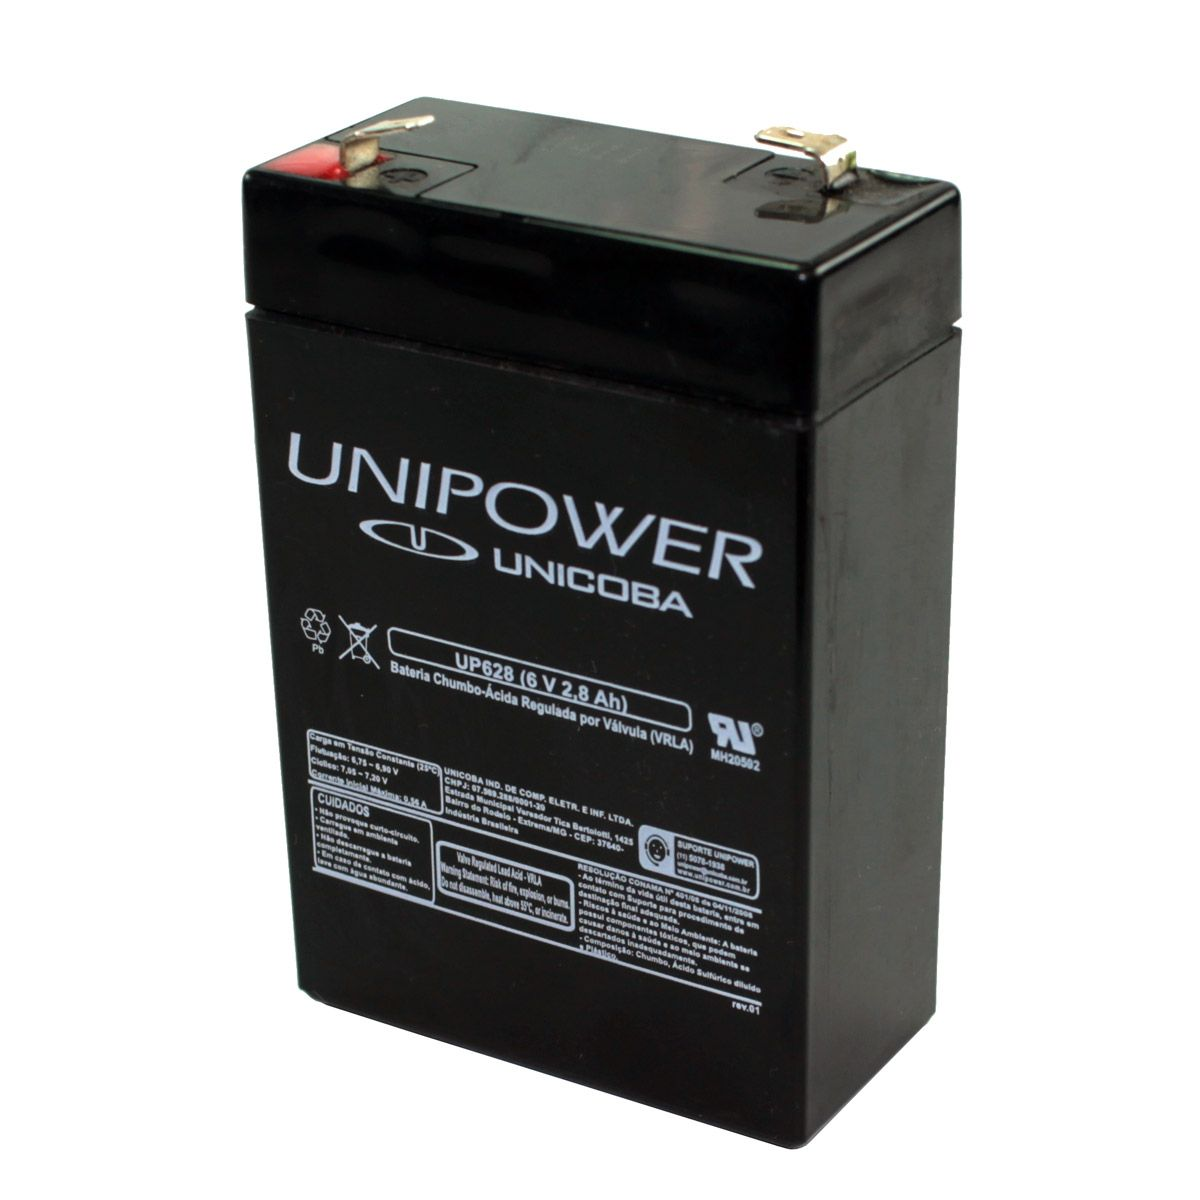 Bateria Selada 6V 2,8AH - UP628 Unipower